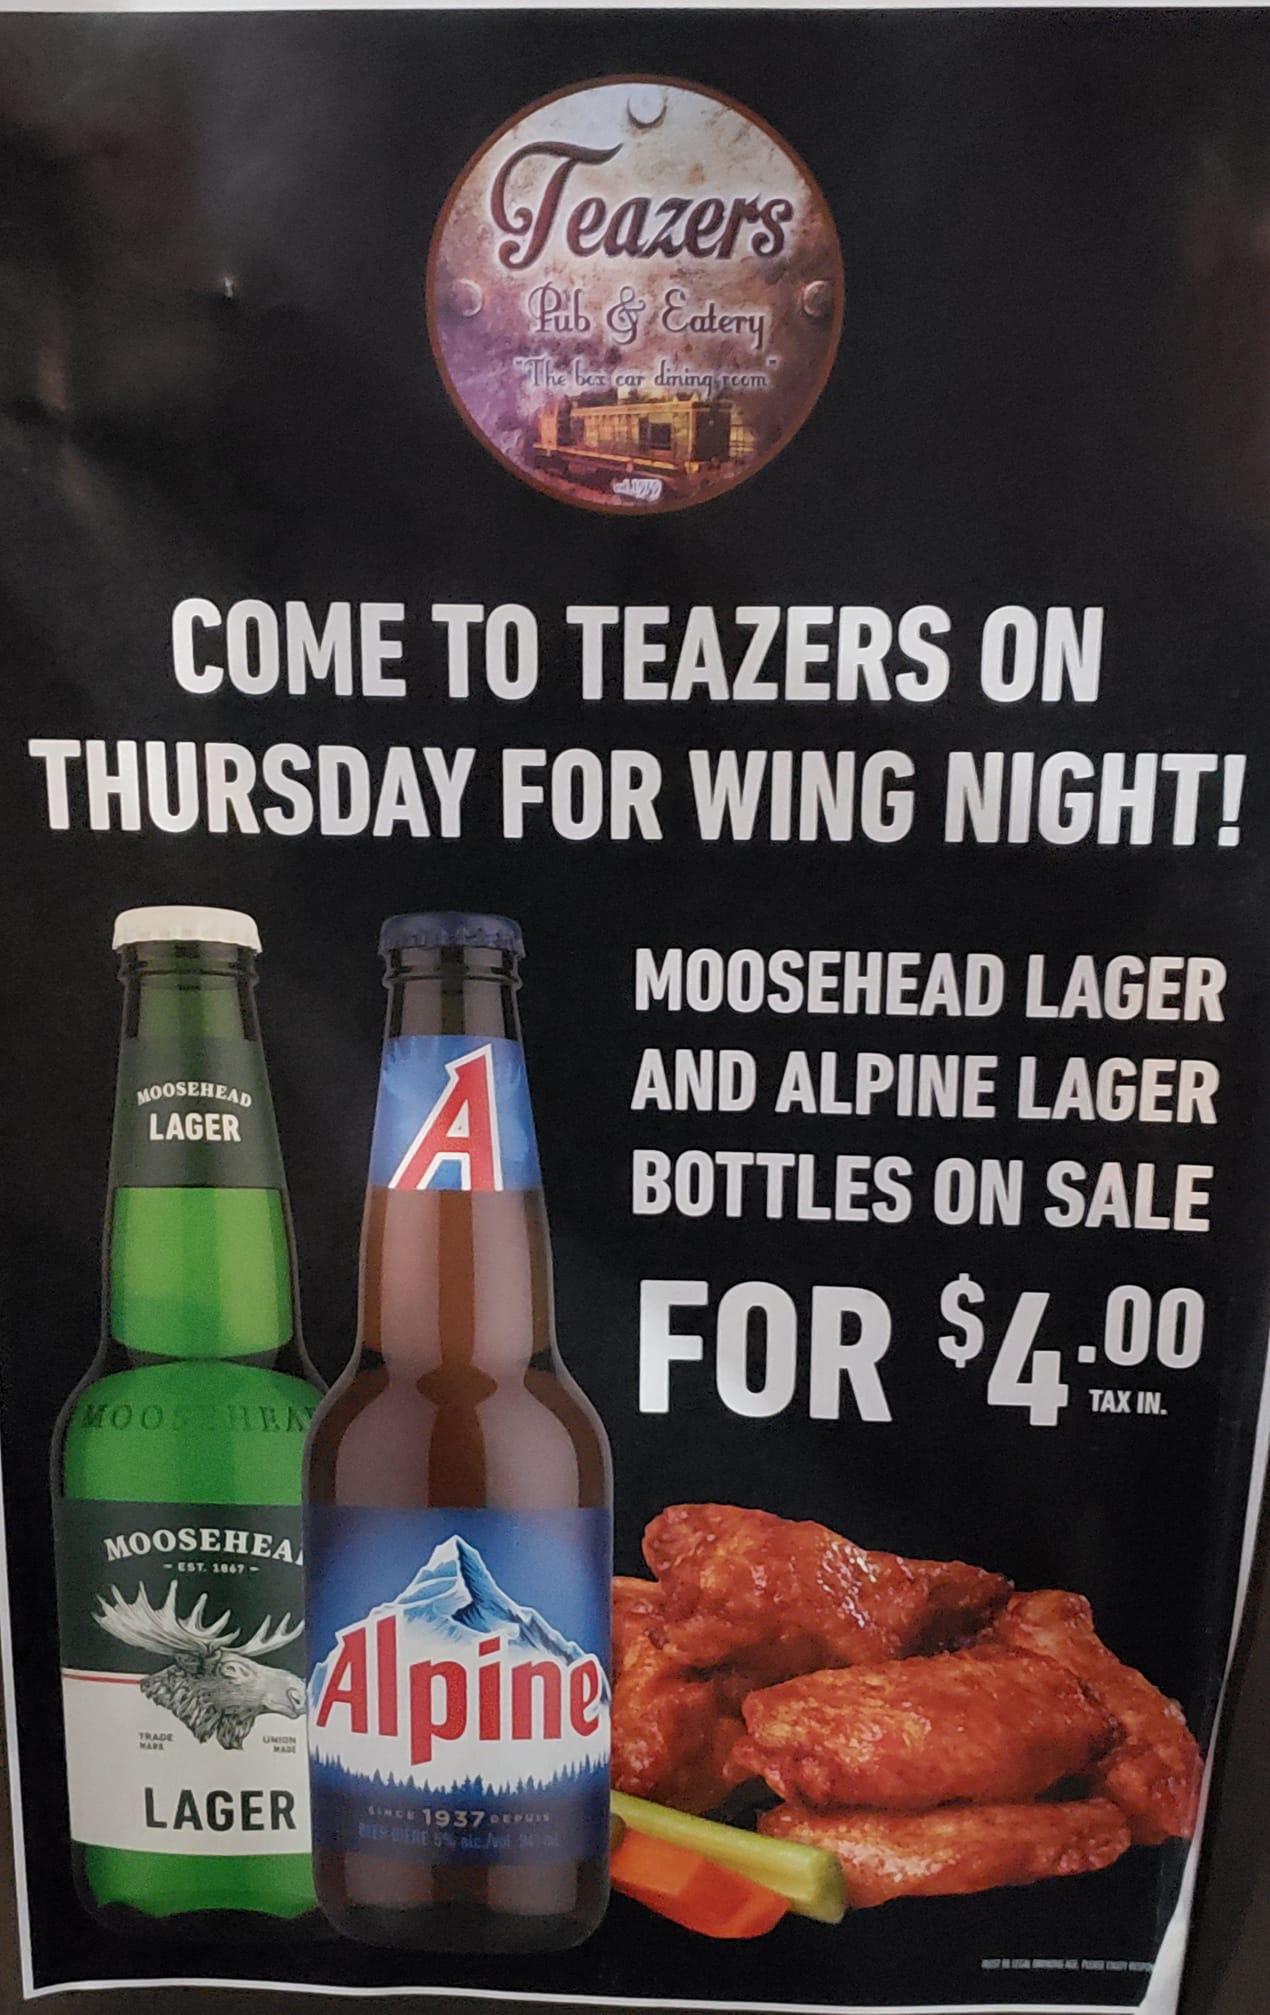 Teazer's Pub & Eatery 10 Gerard Ave, Amherst